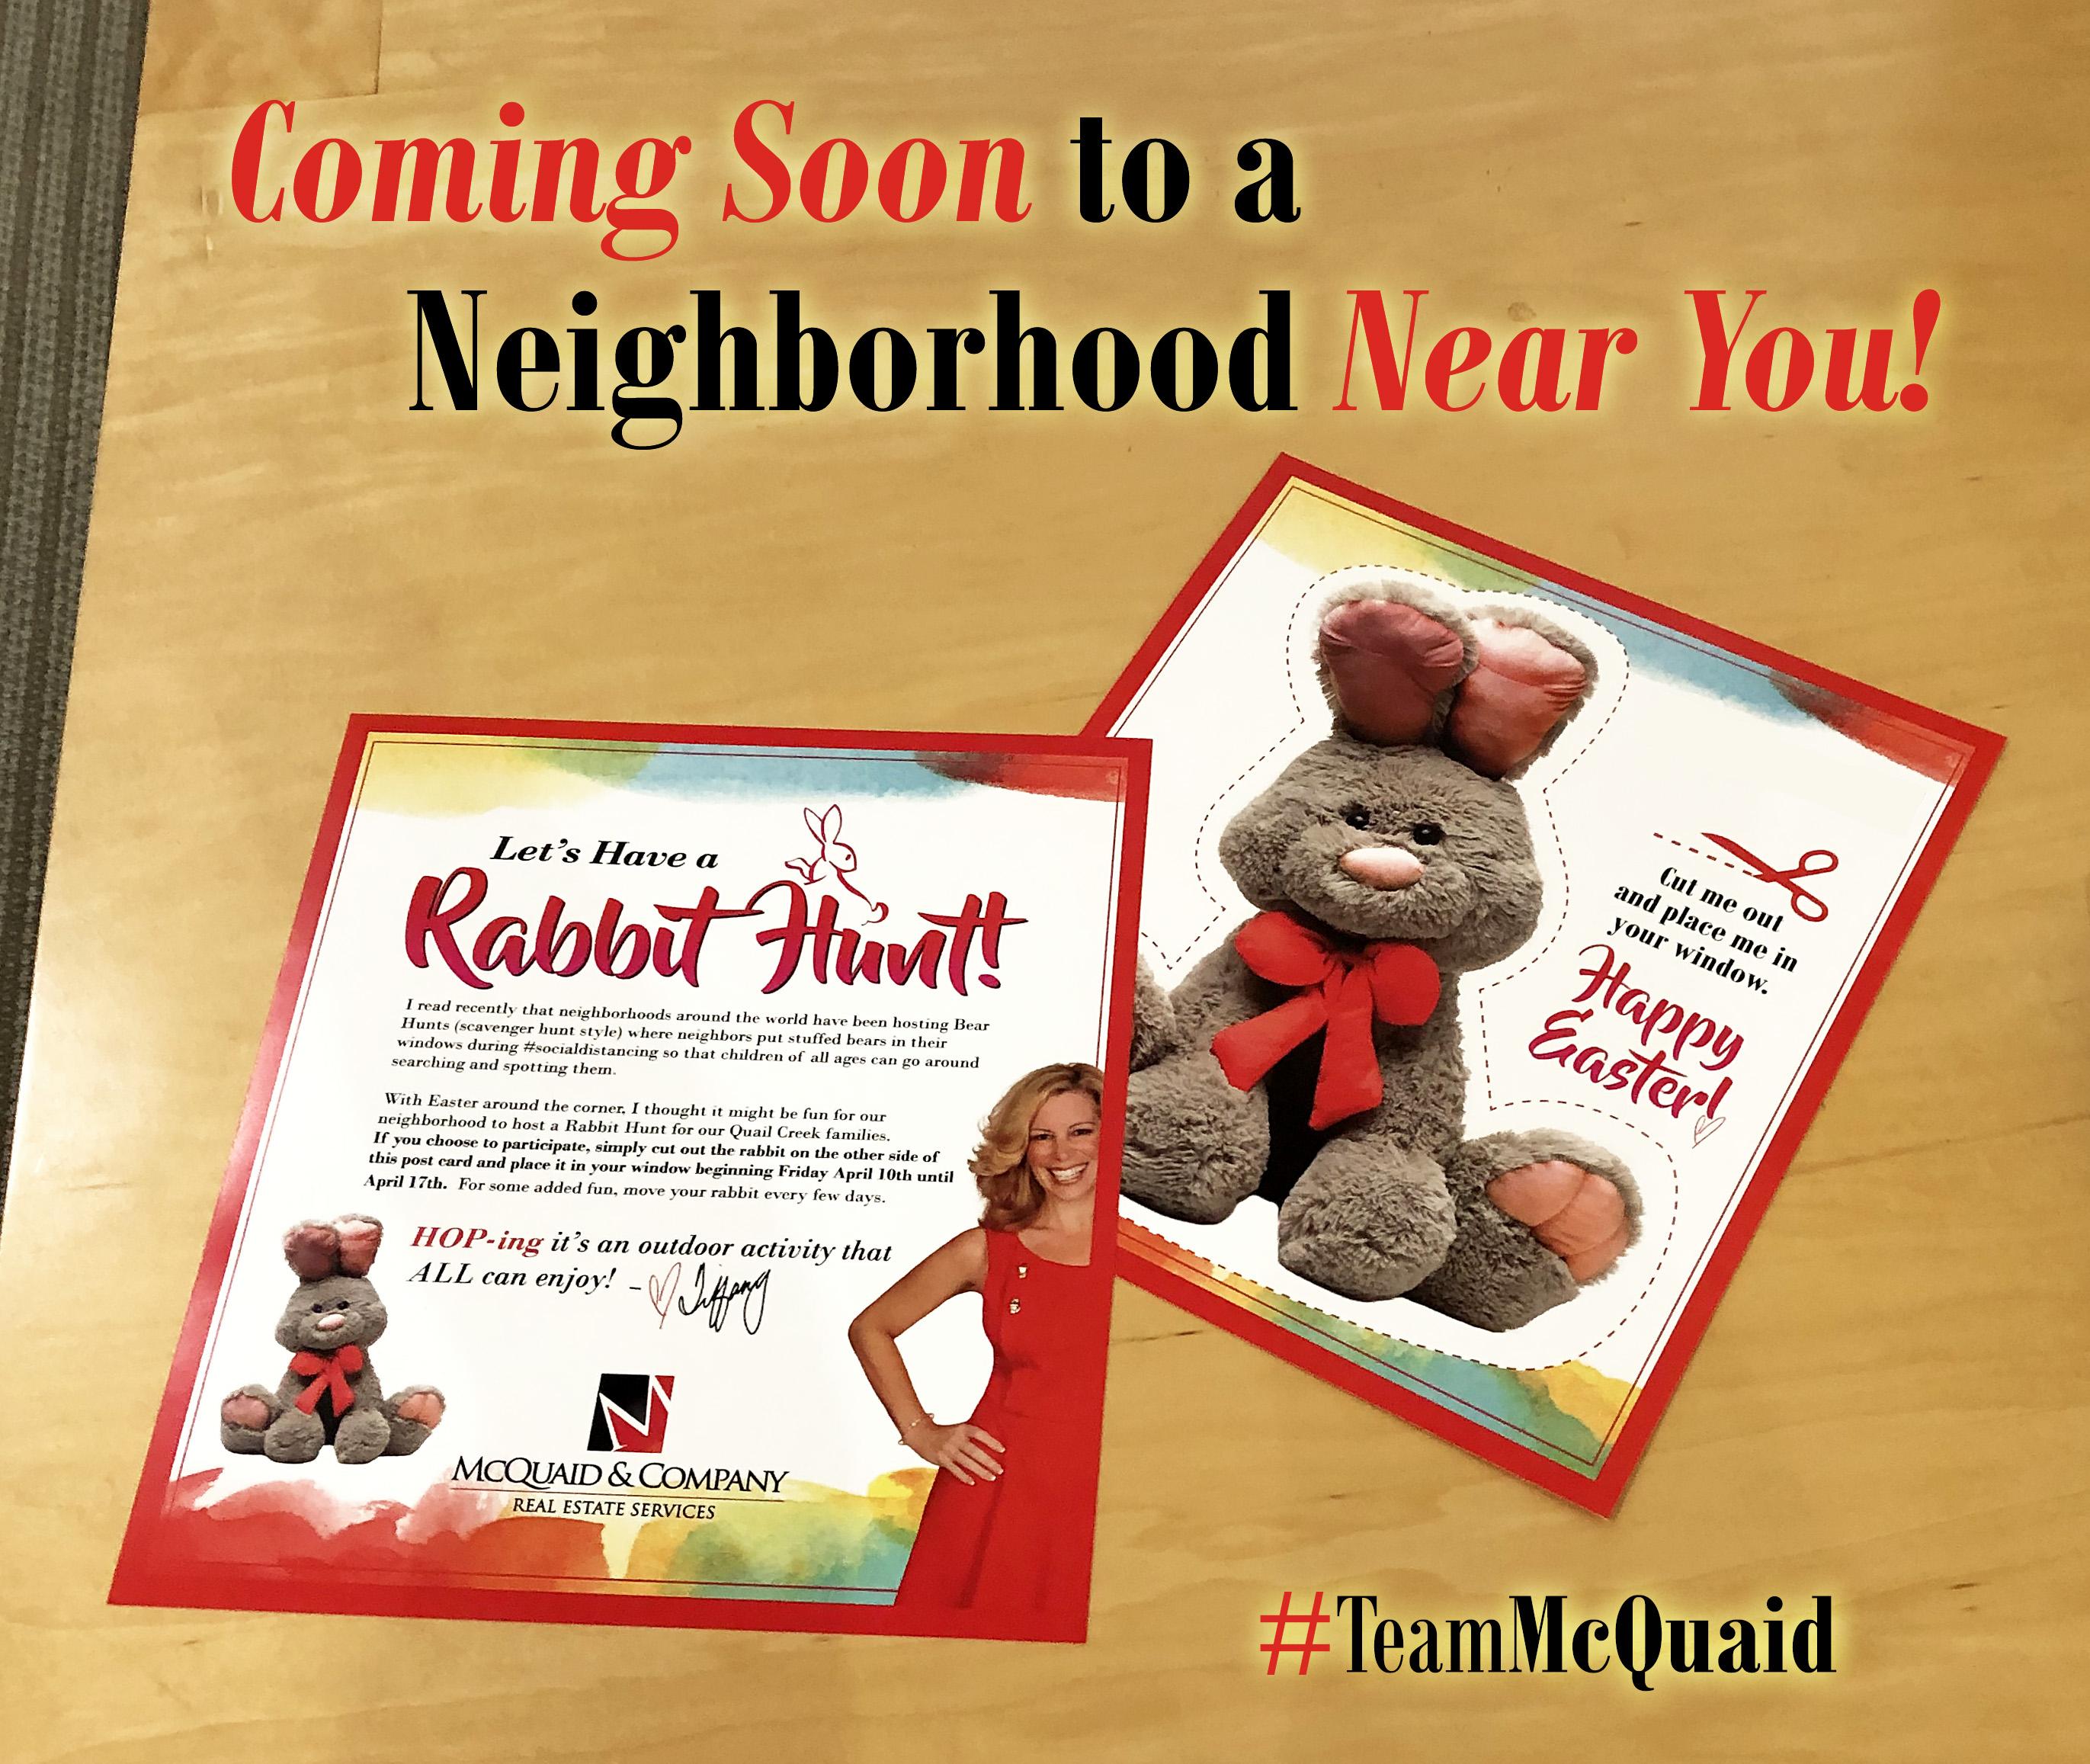 Coming Soon to a Neighborhood Near You!